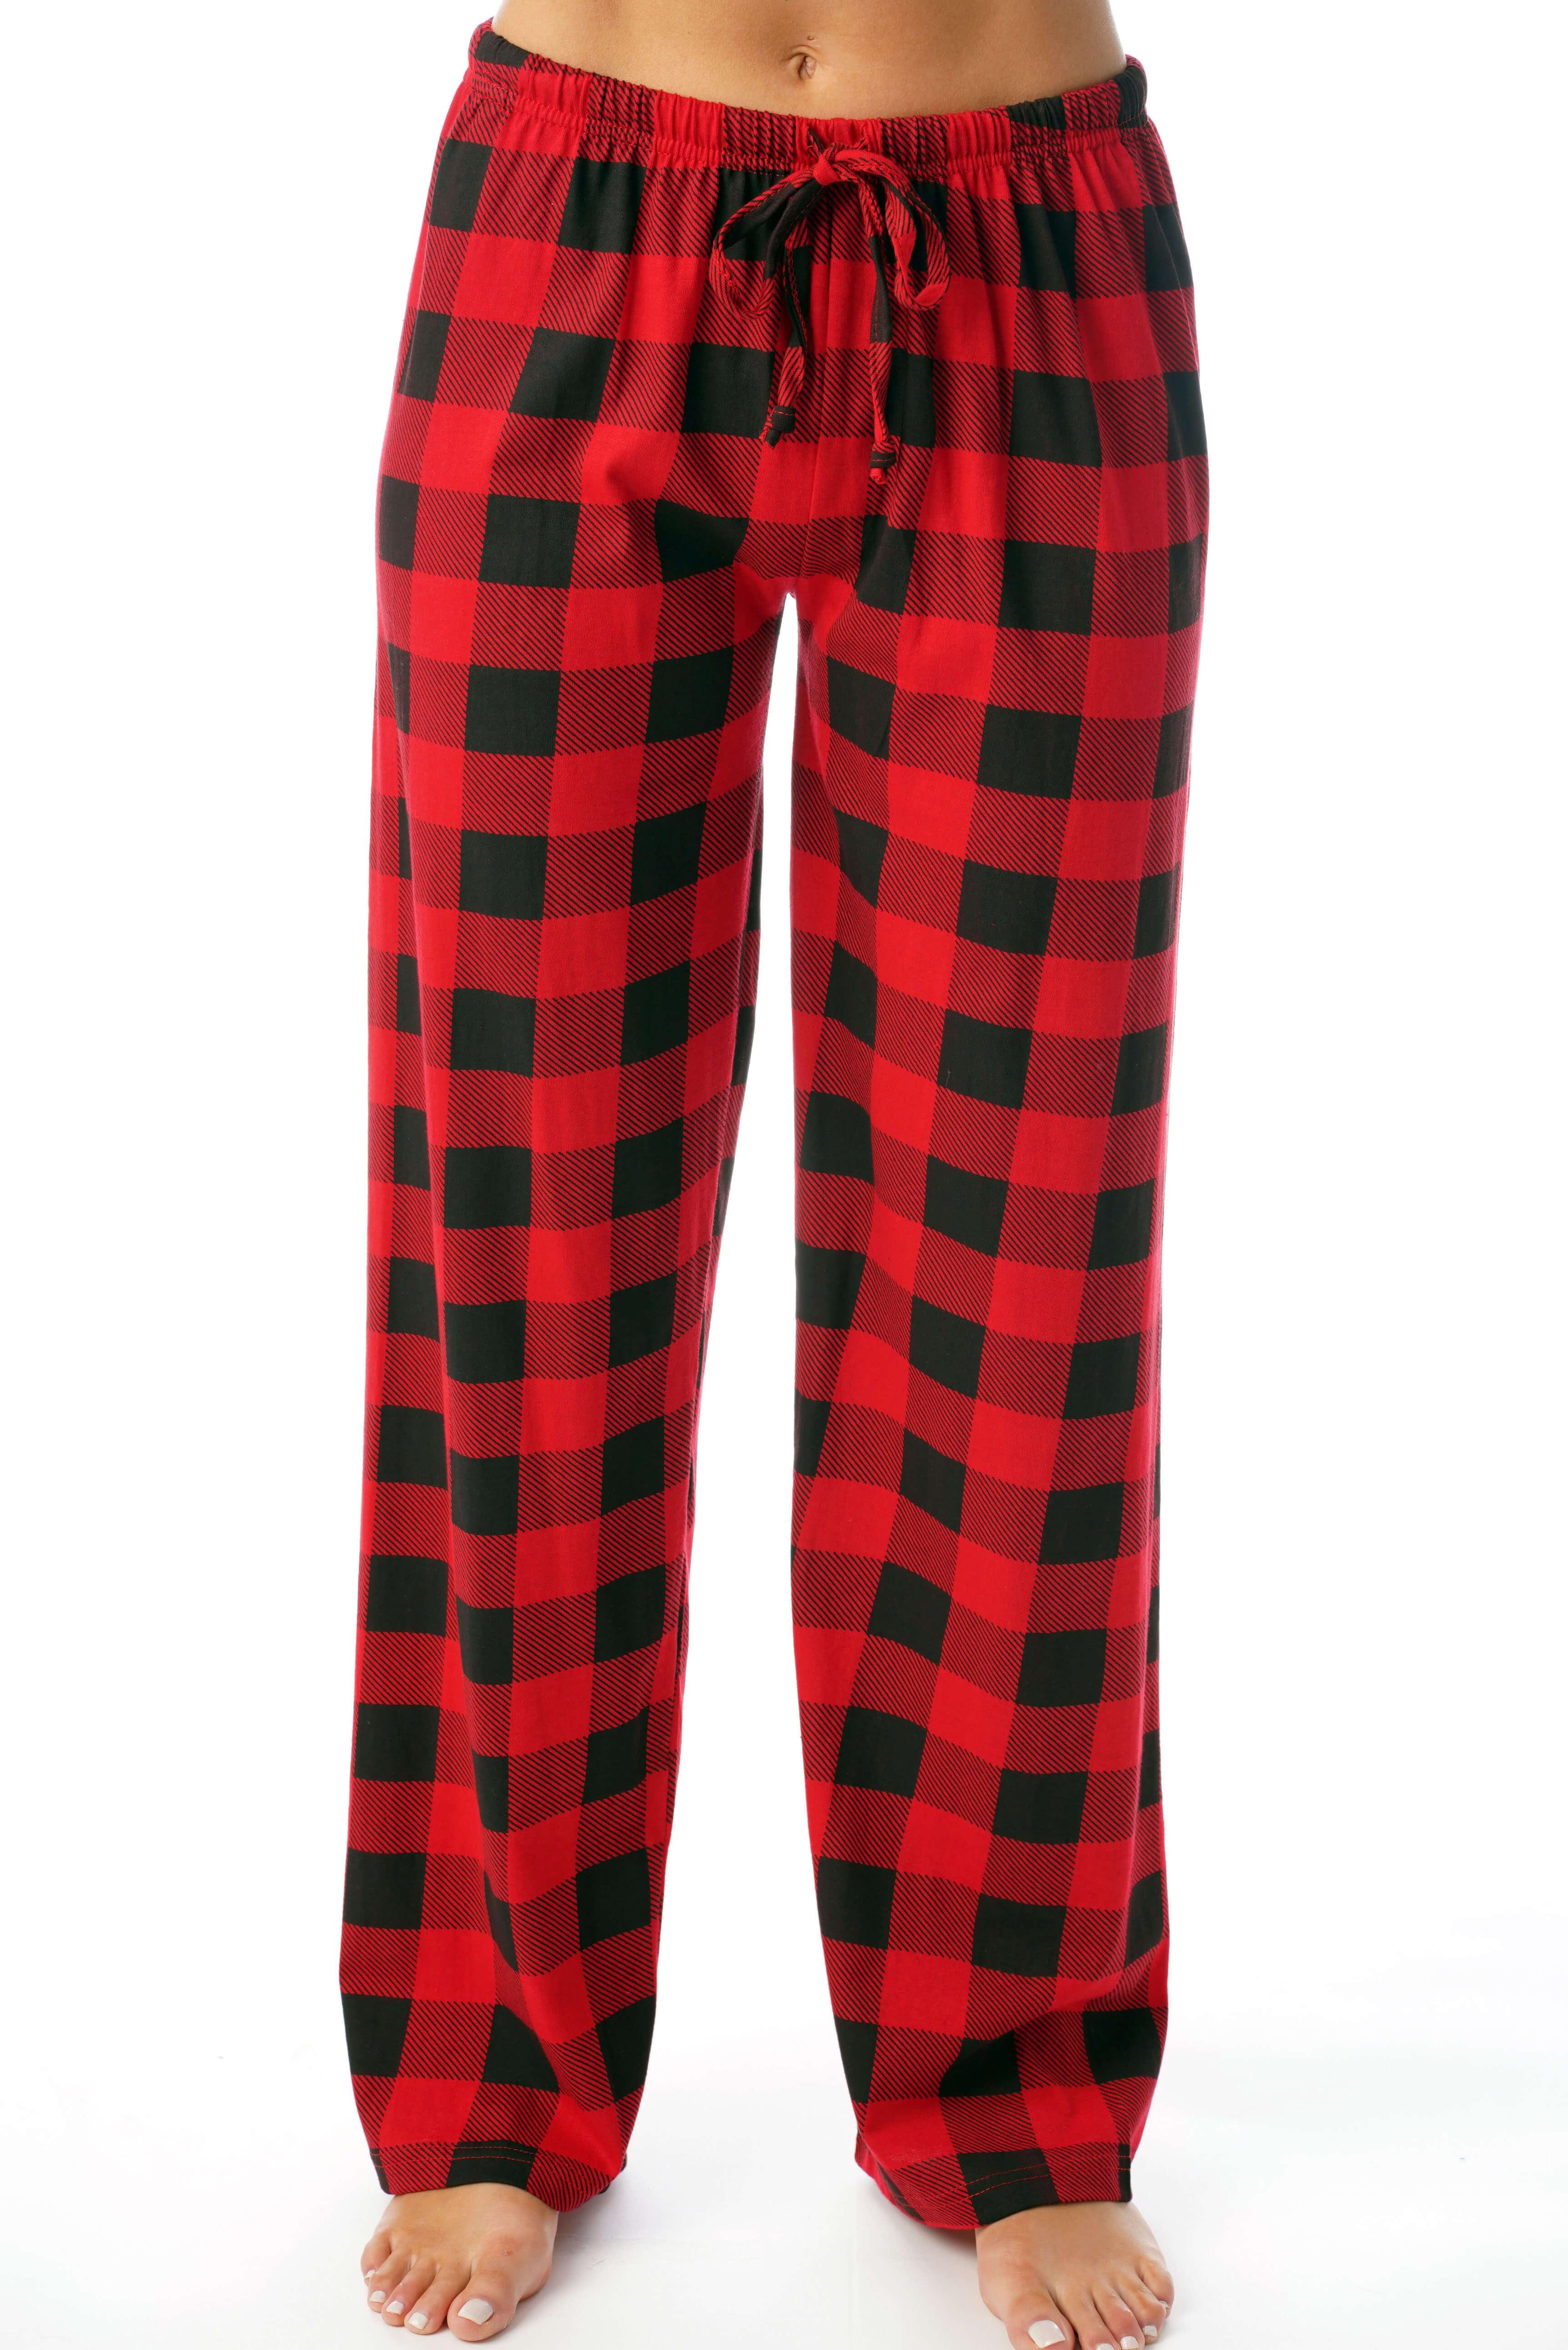 Just Love - Just Love Women Buffalo Plaid Cotton Pajama ...